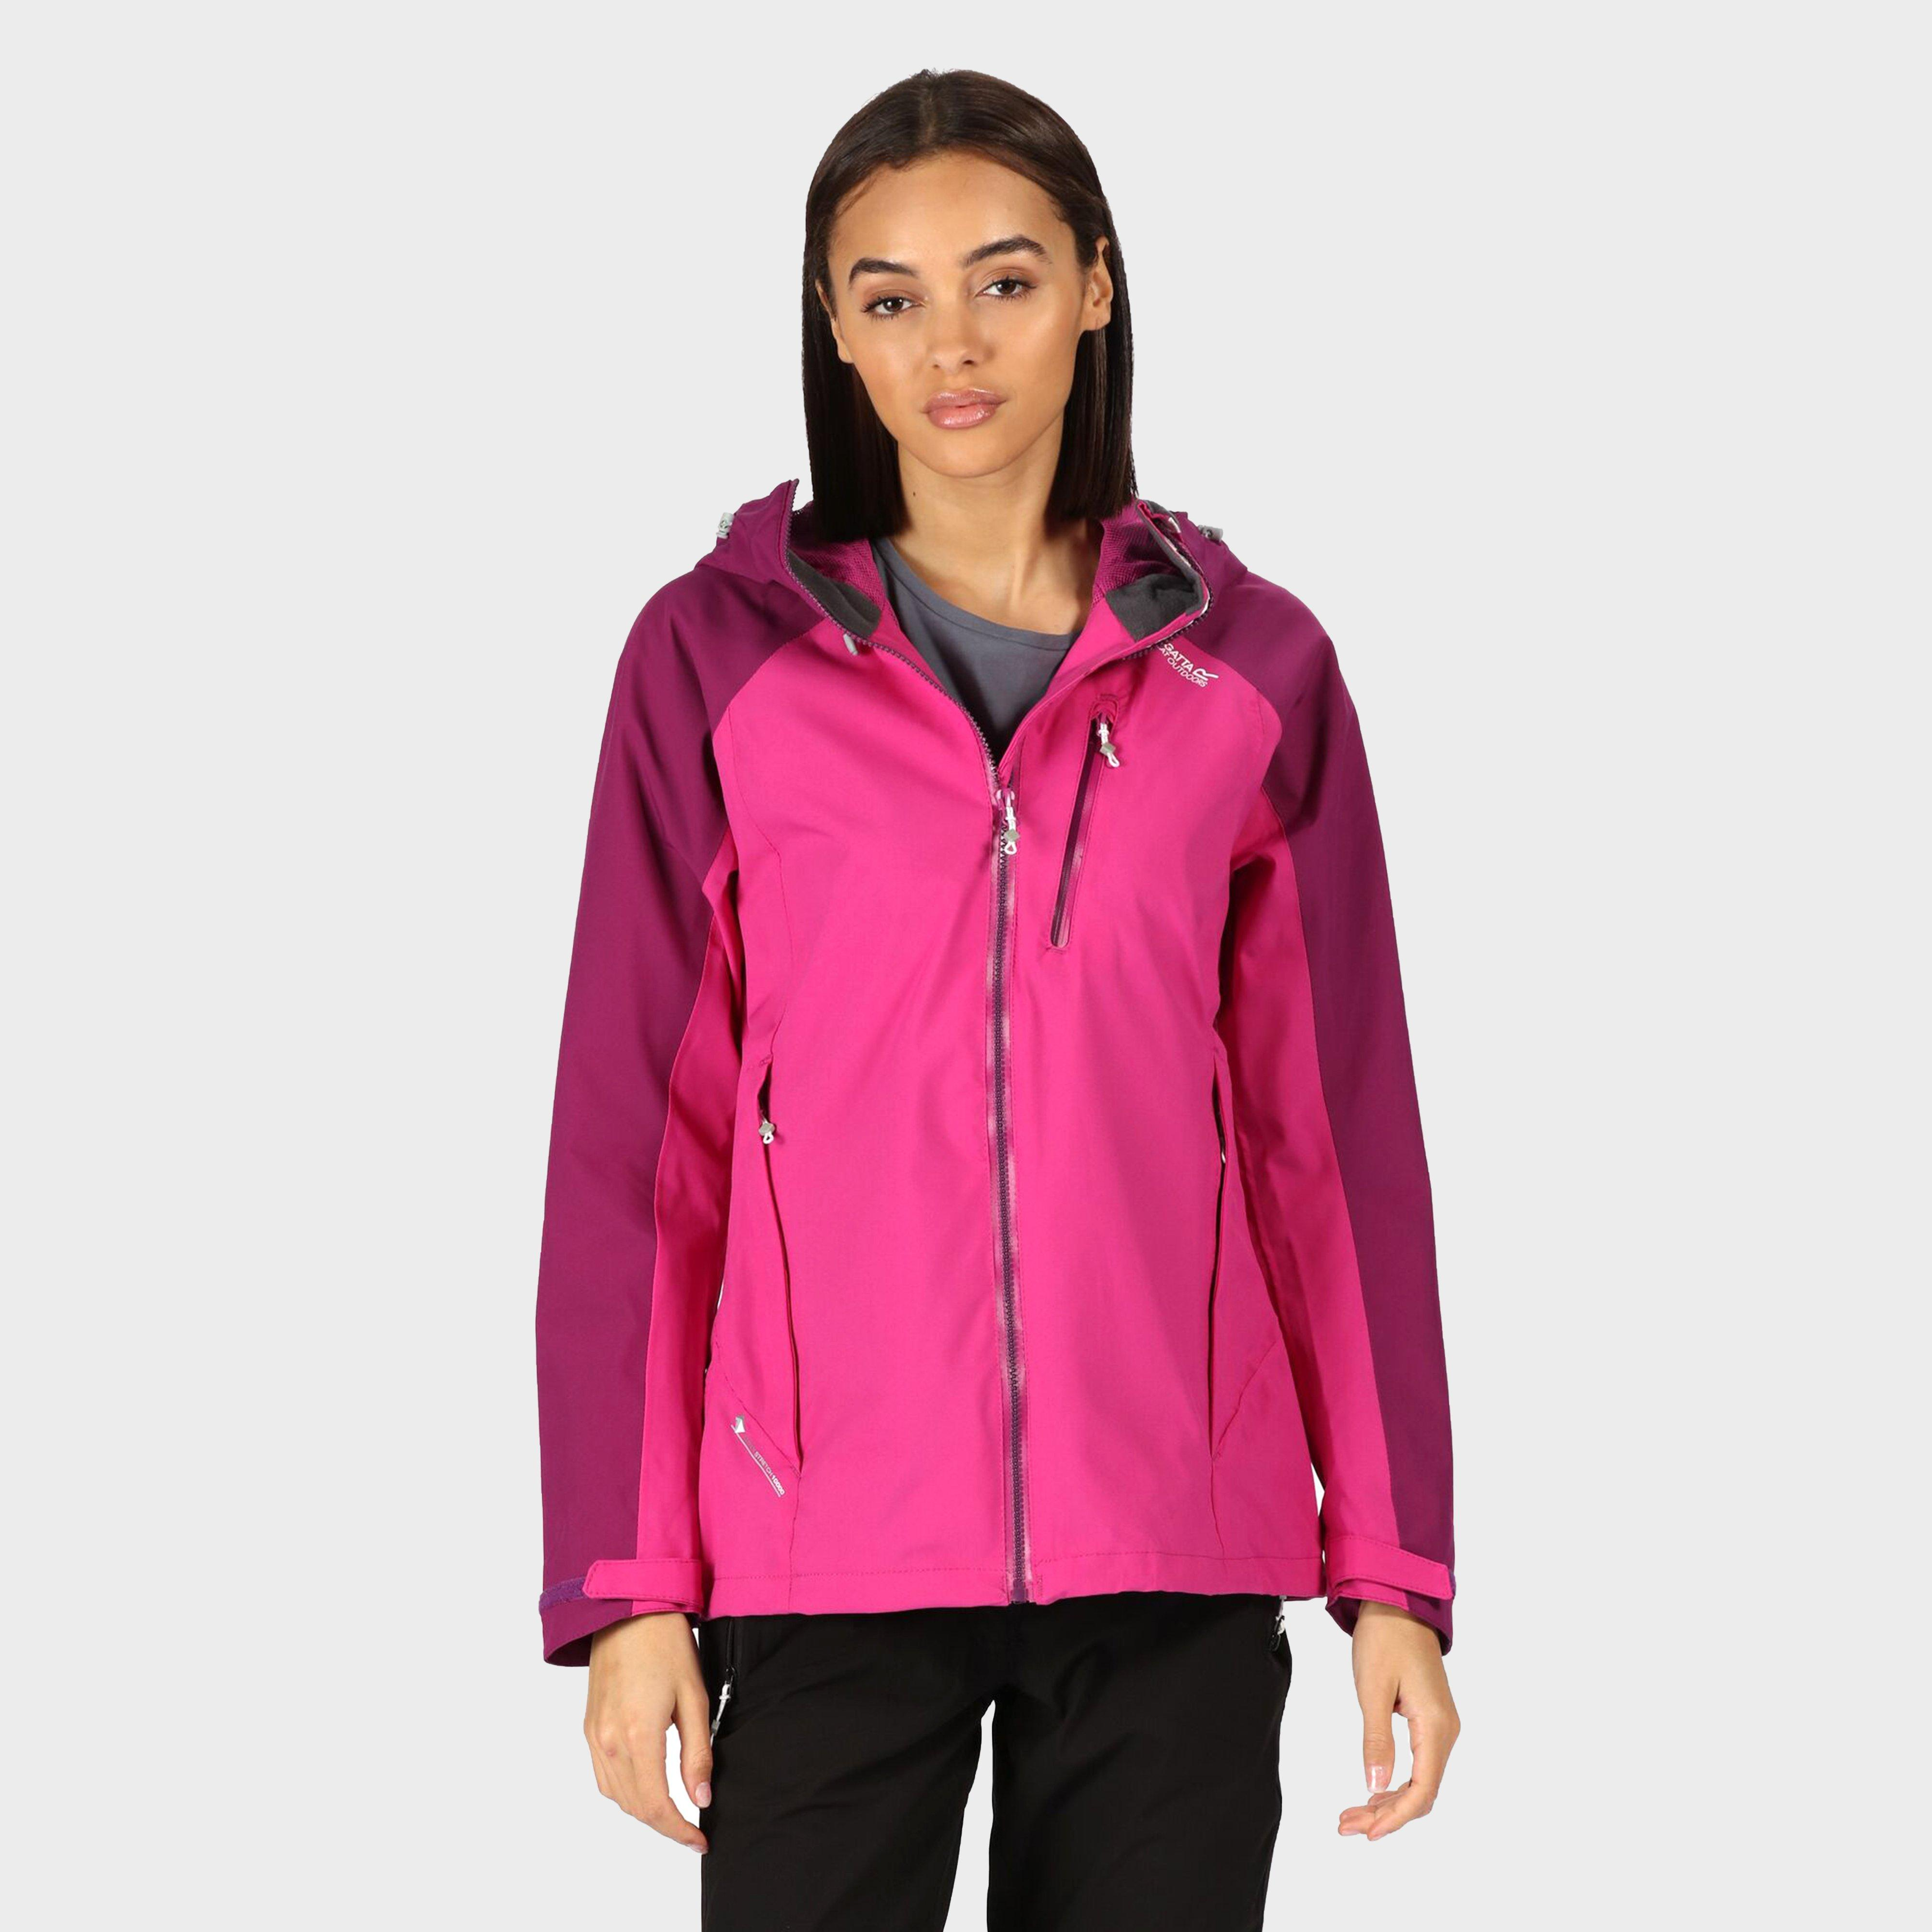 Regatta Regatta womens Birchdale Waterproof Jacket, Pink